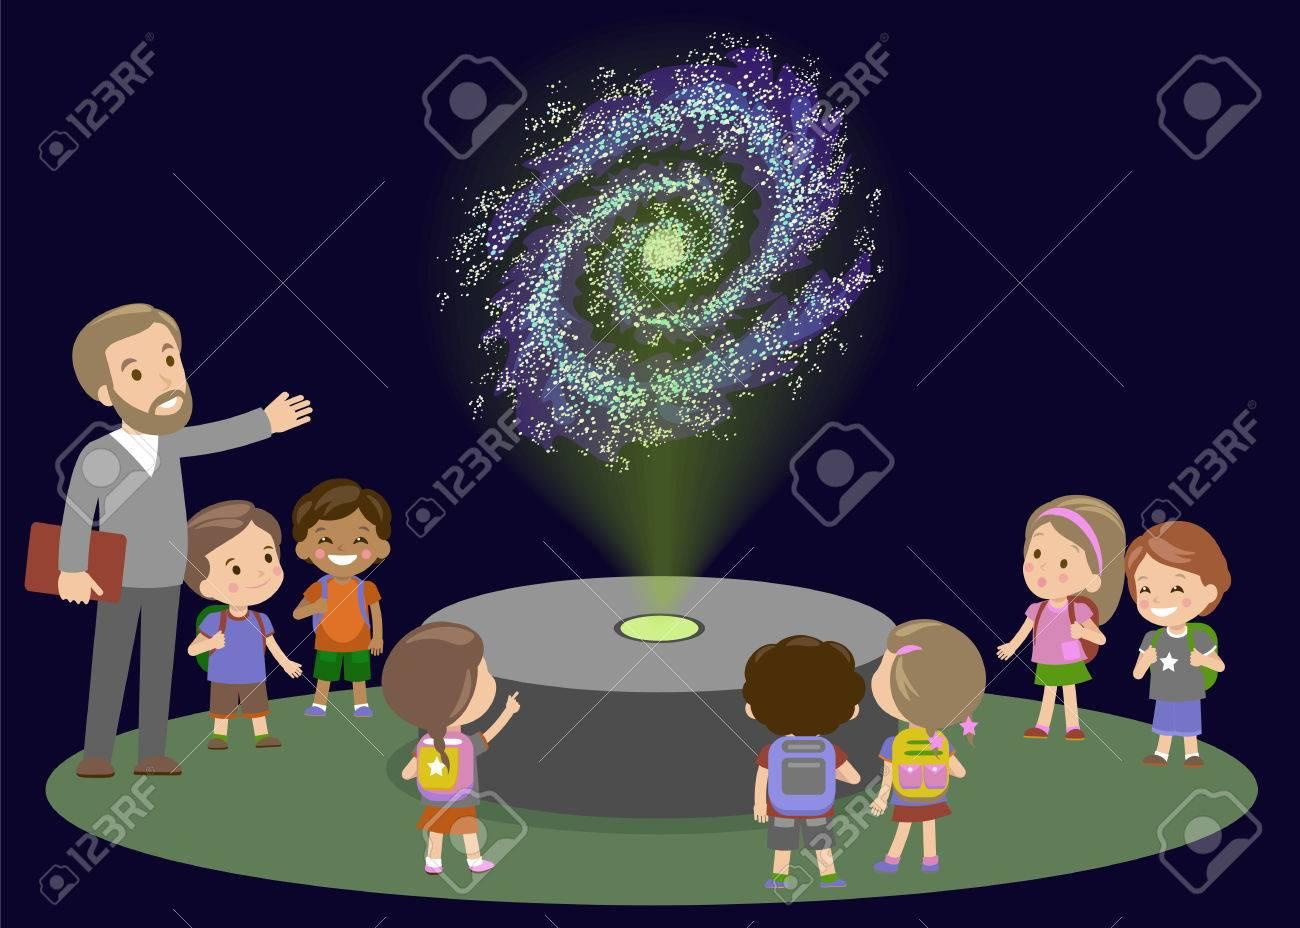 Galaxy clipart teacher. Free download clip art